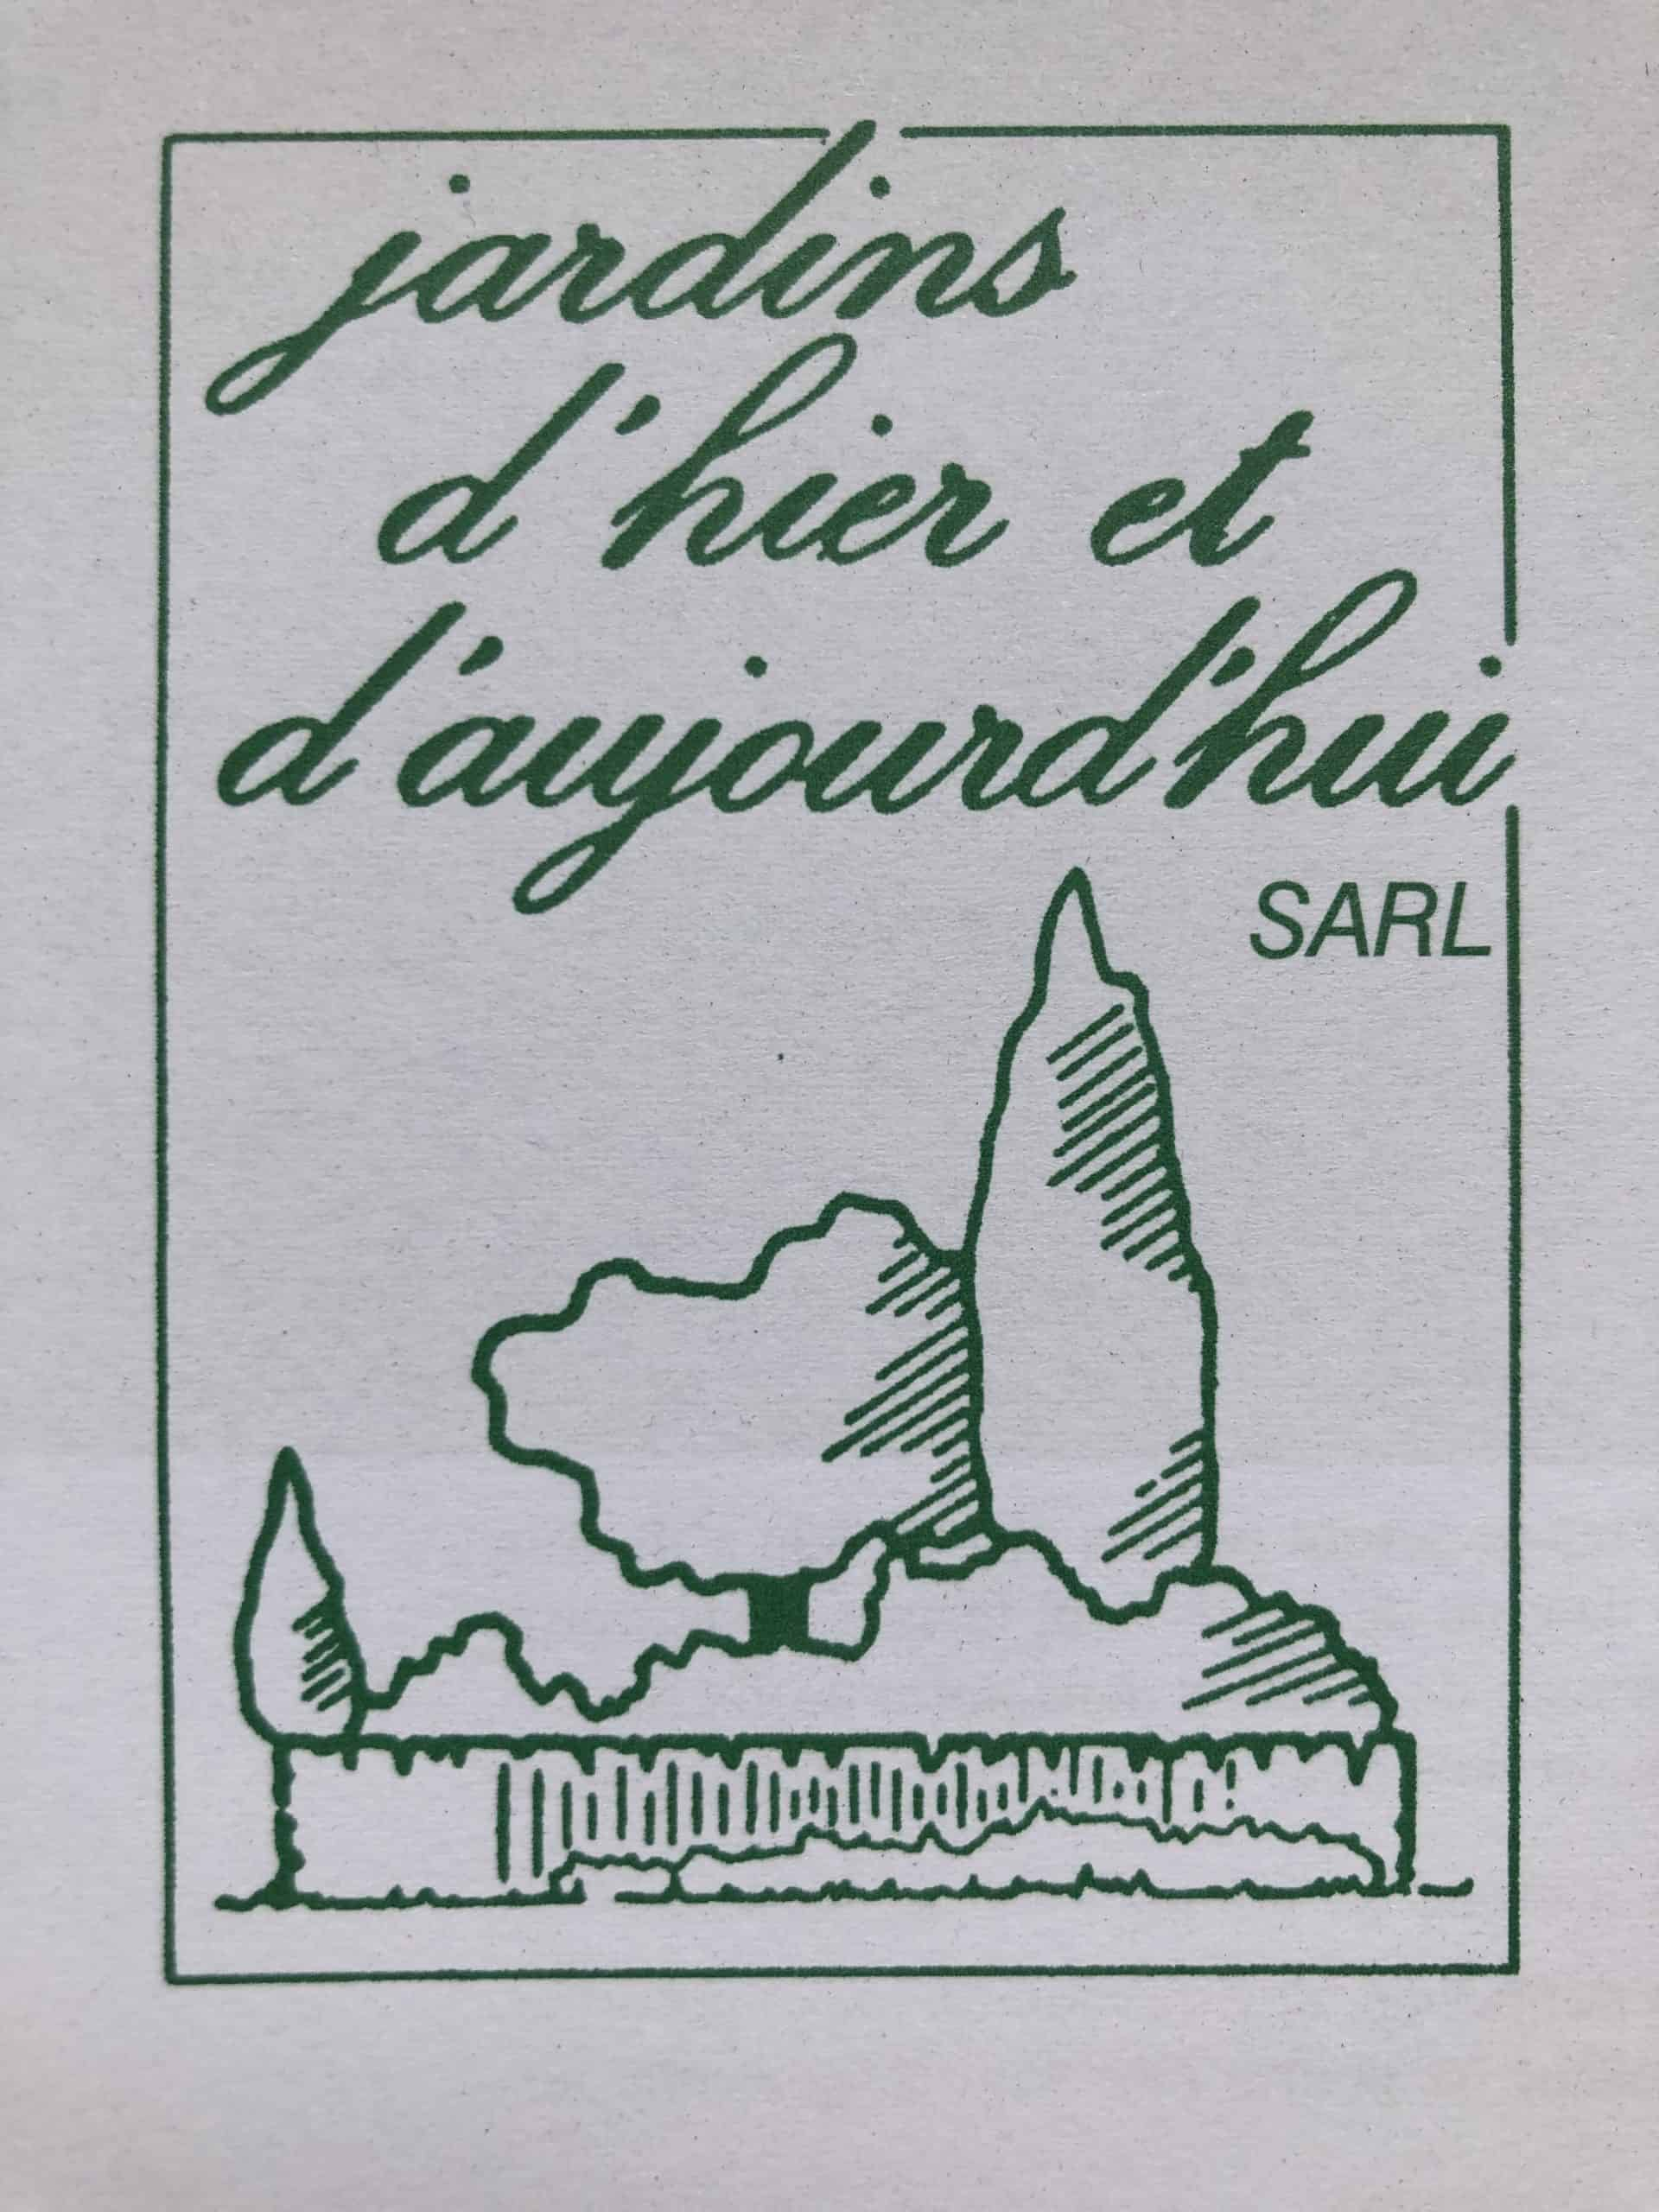 Logo JARDINS D'HIER ET D'AUJOURD'HUI